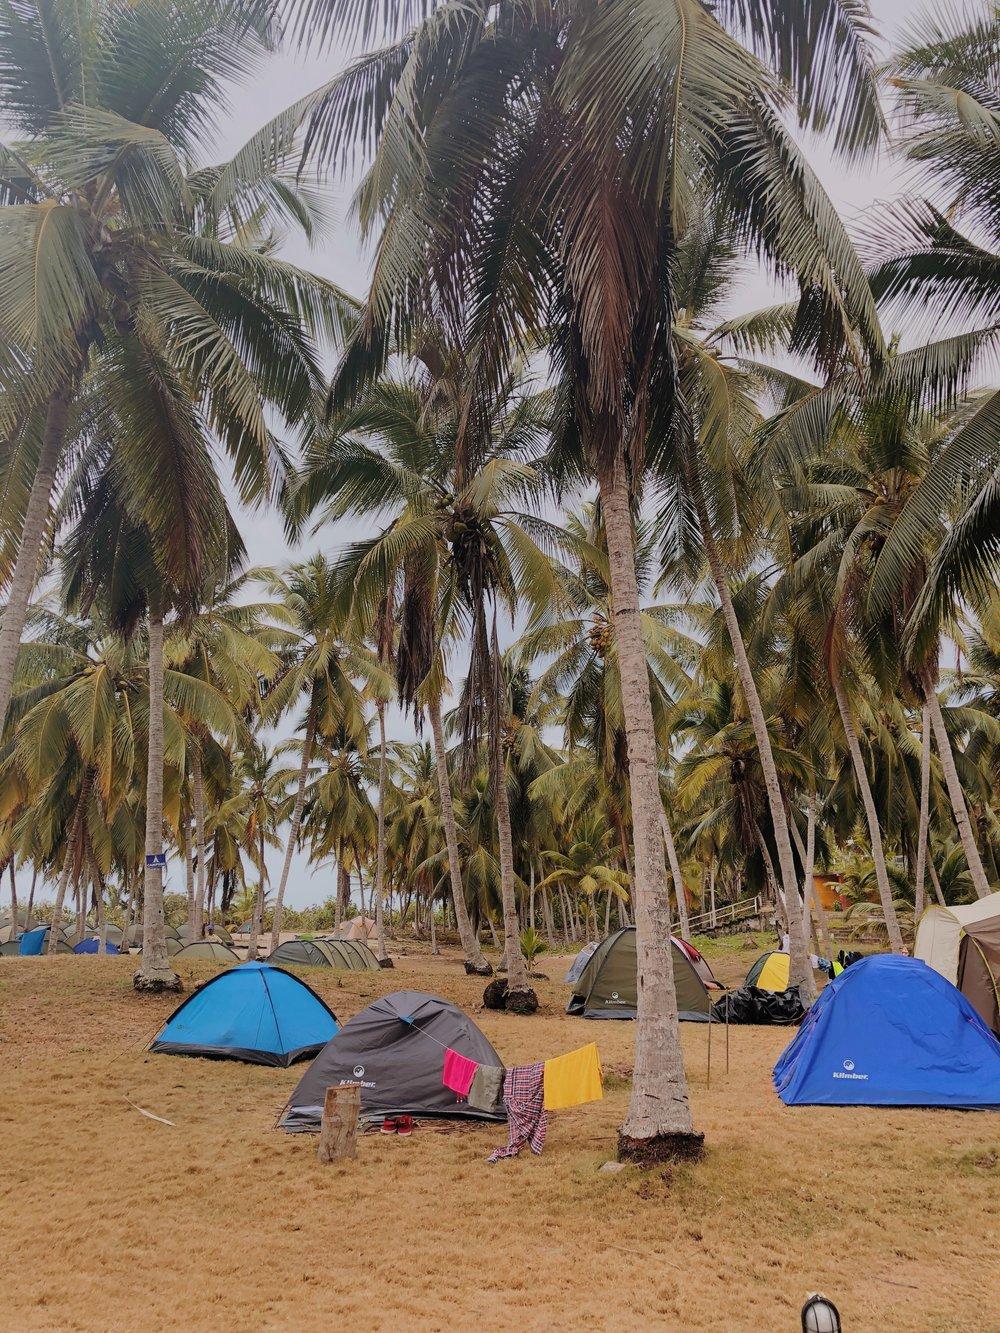 Camping Grounds in Tayrona